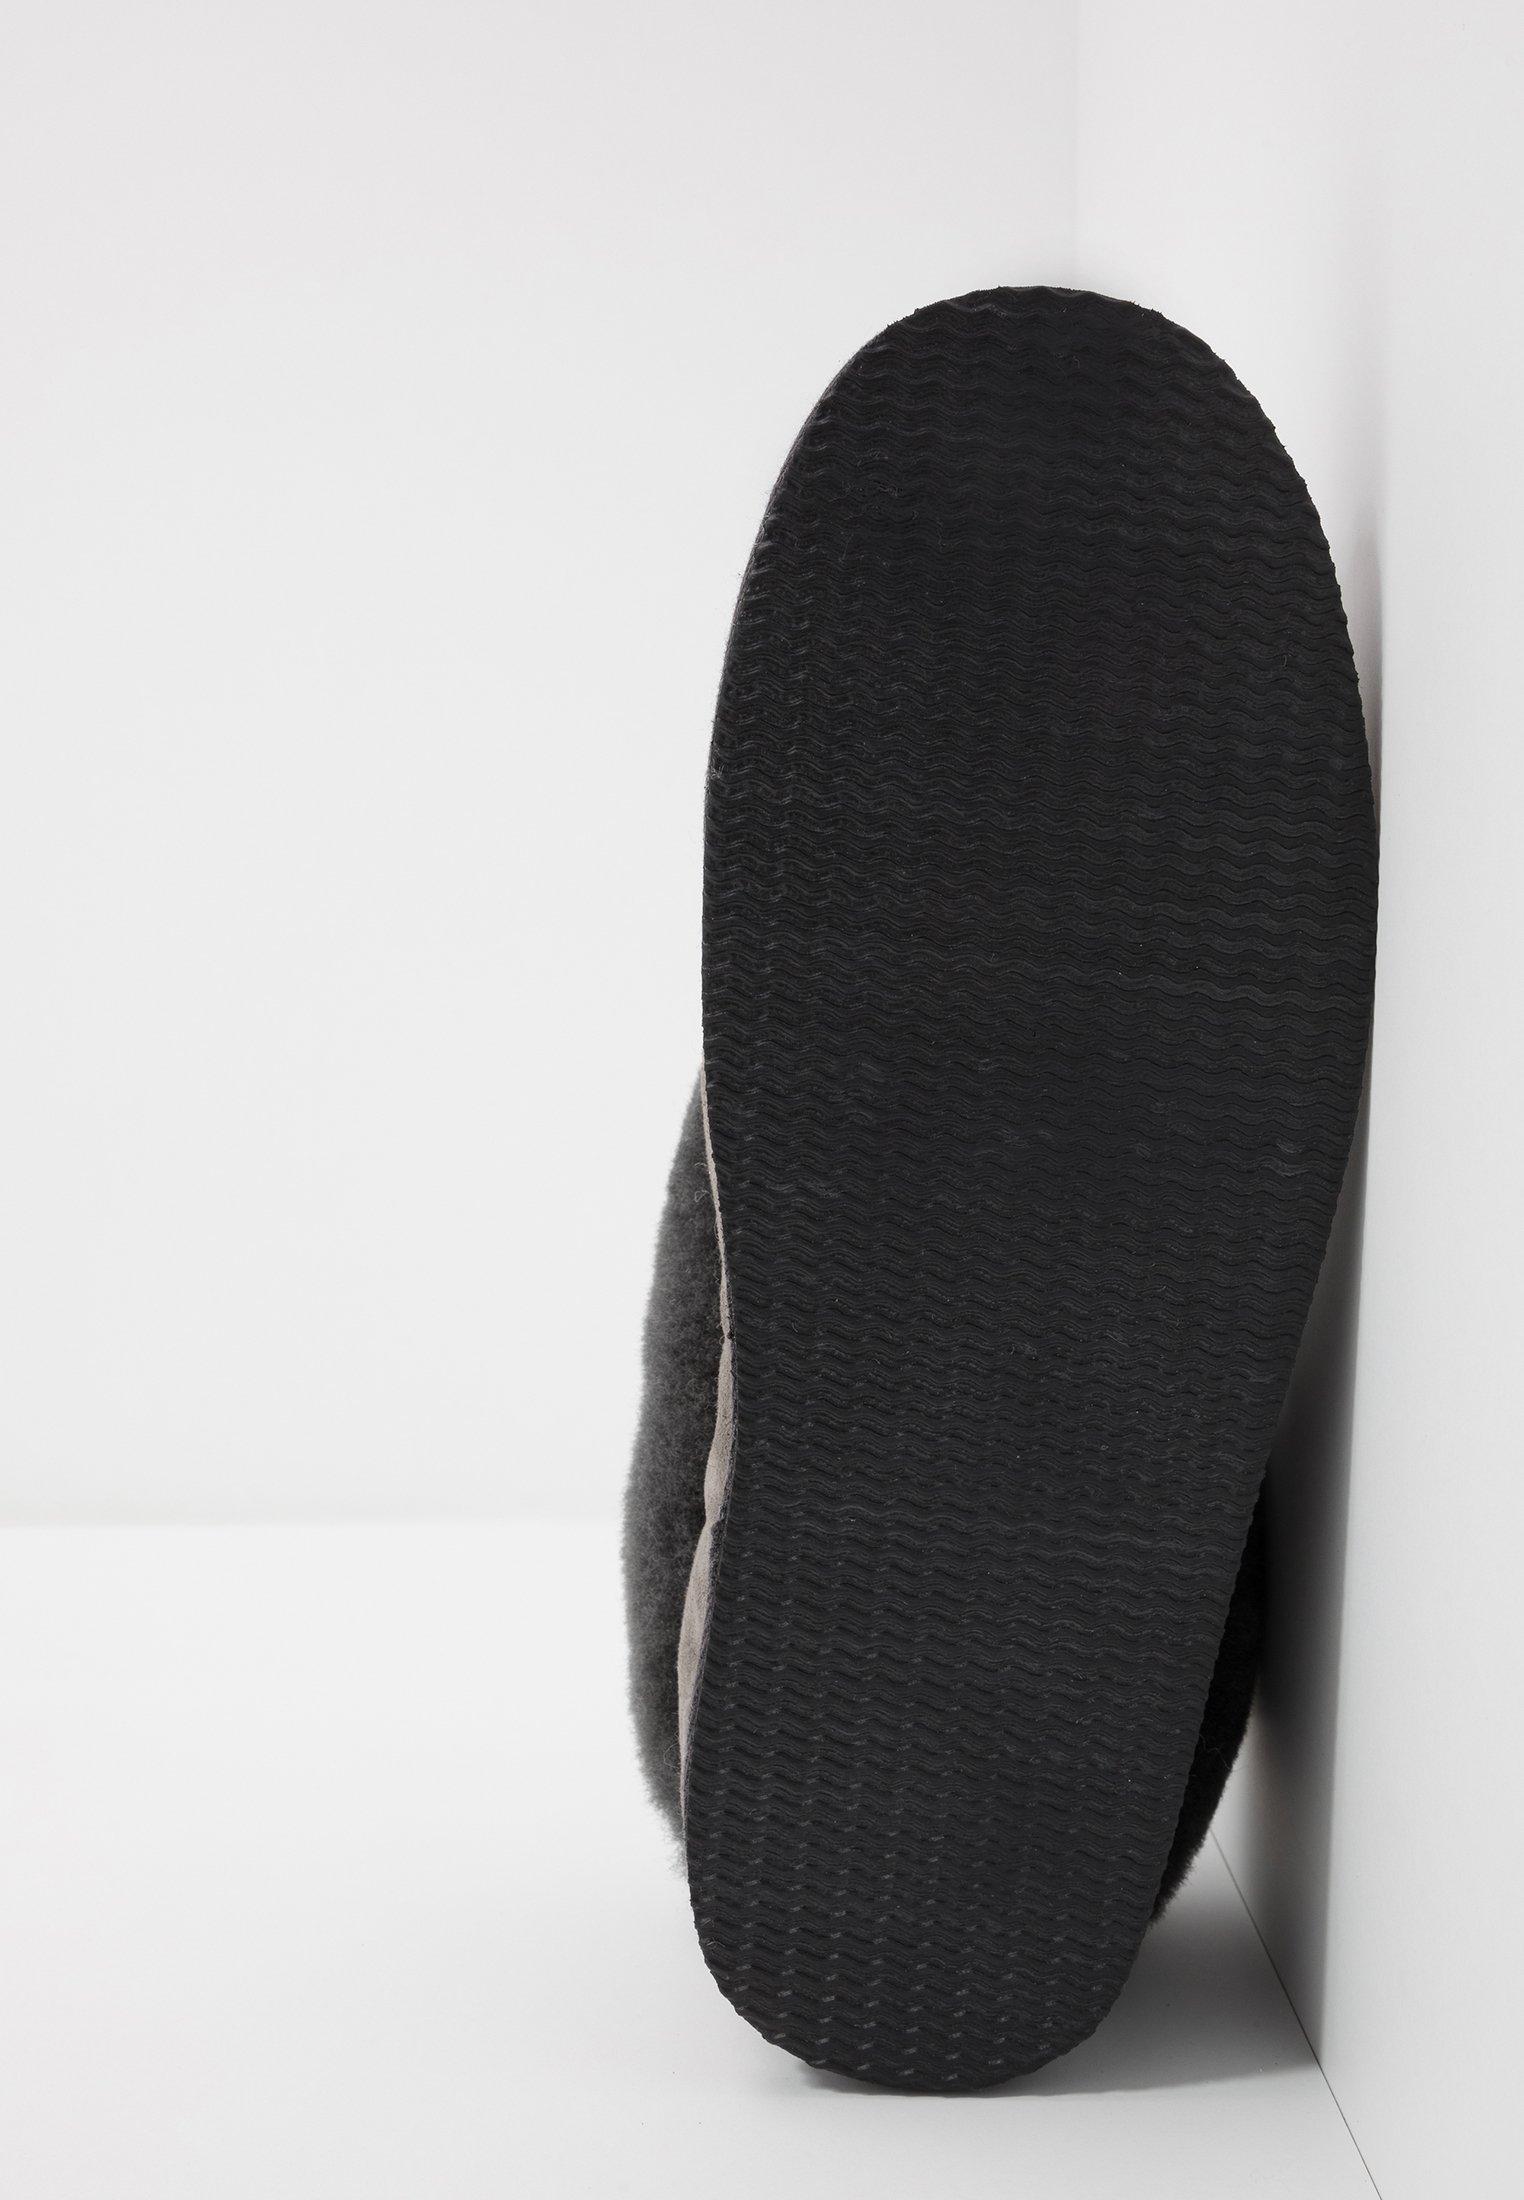 Economico di alta qualità Scarpe da uomo Shepherd KRISTER Pantofole asphalt